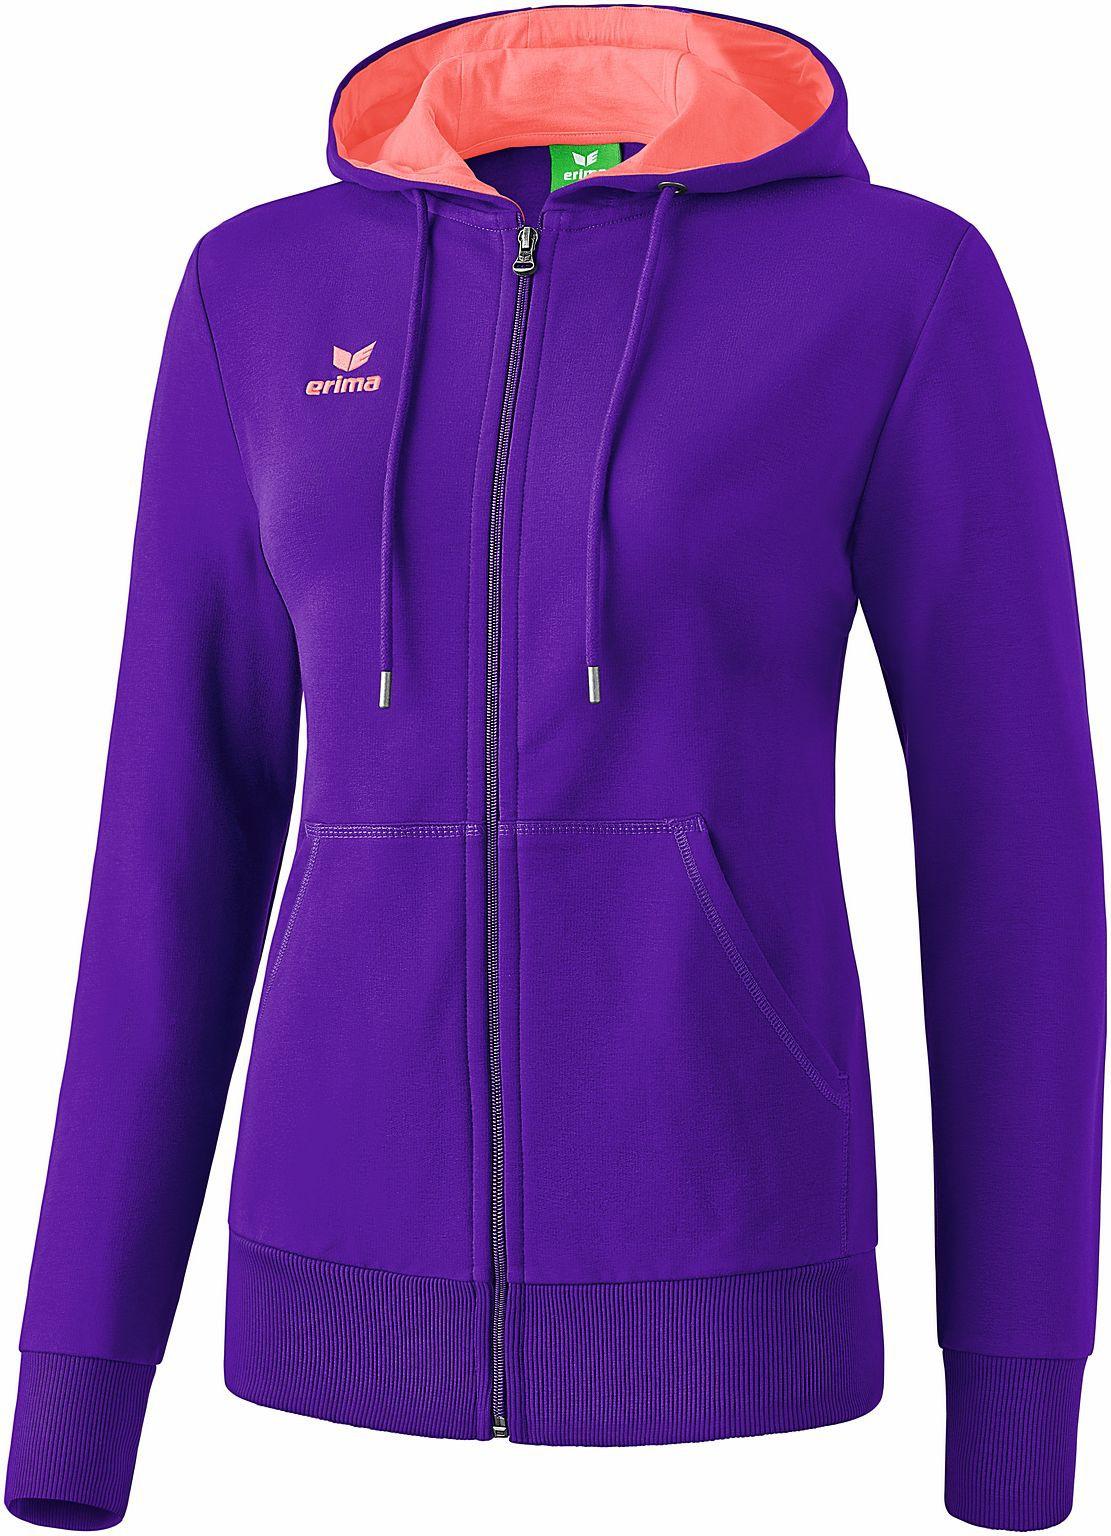 erima graffic 5 c sweatjacke mit kapuze damen violet coral hoody neu ebay